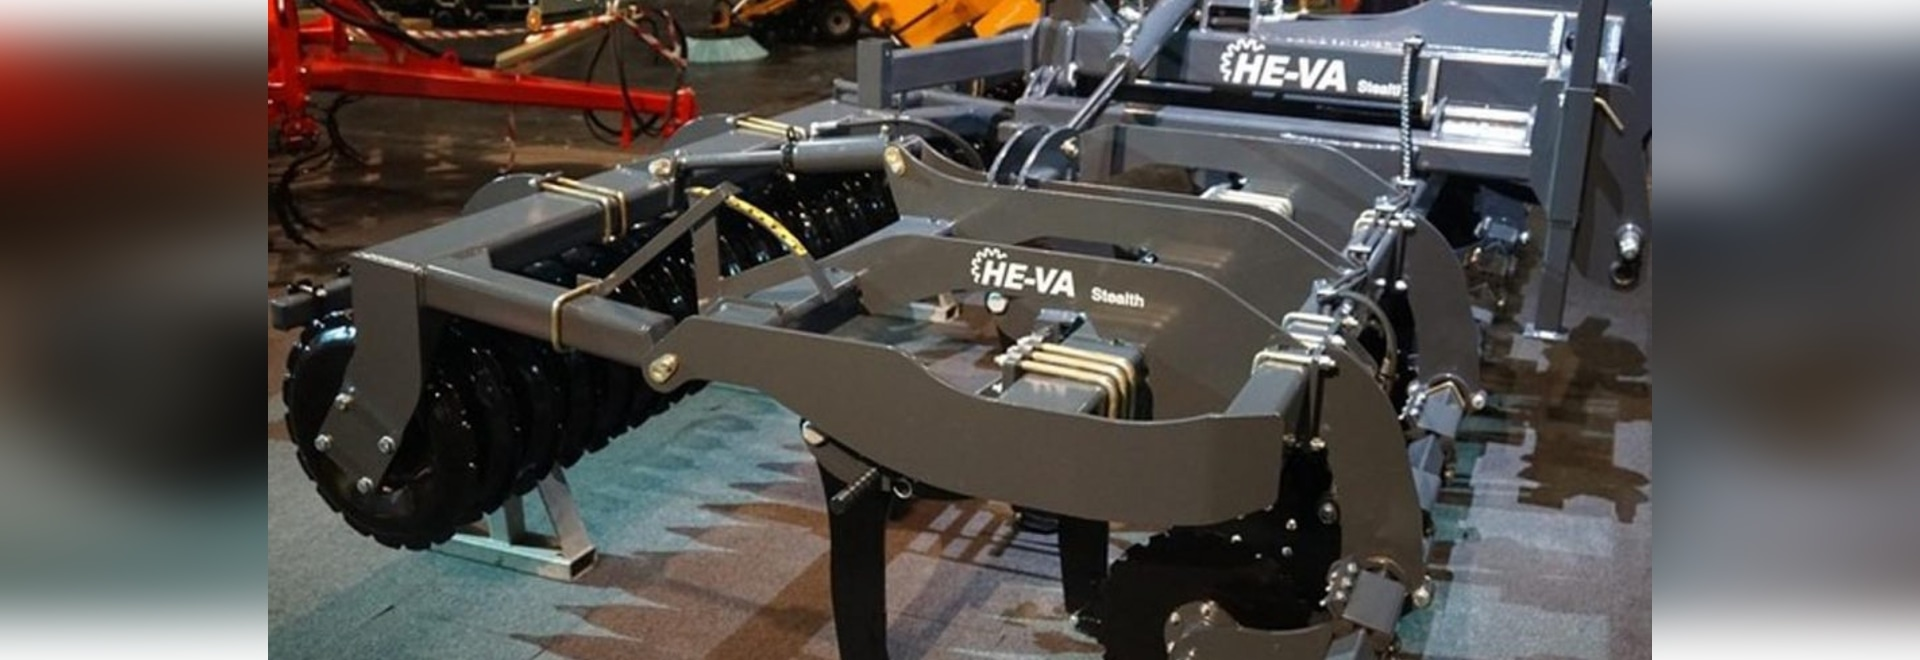 OPICO to launch new HE-VA subsoiler at LAMMA 2020